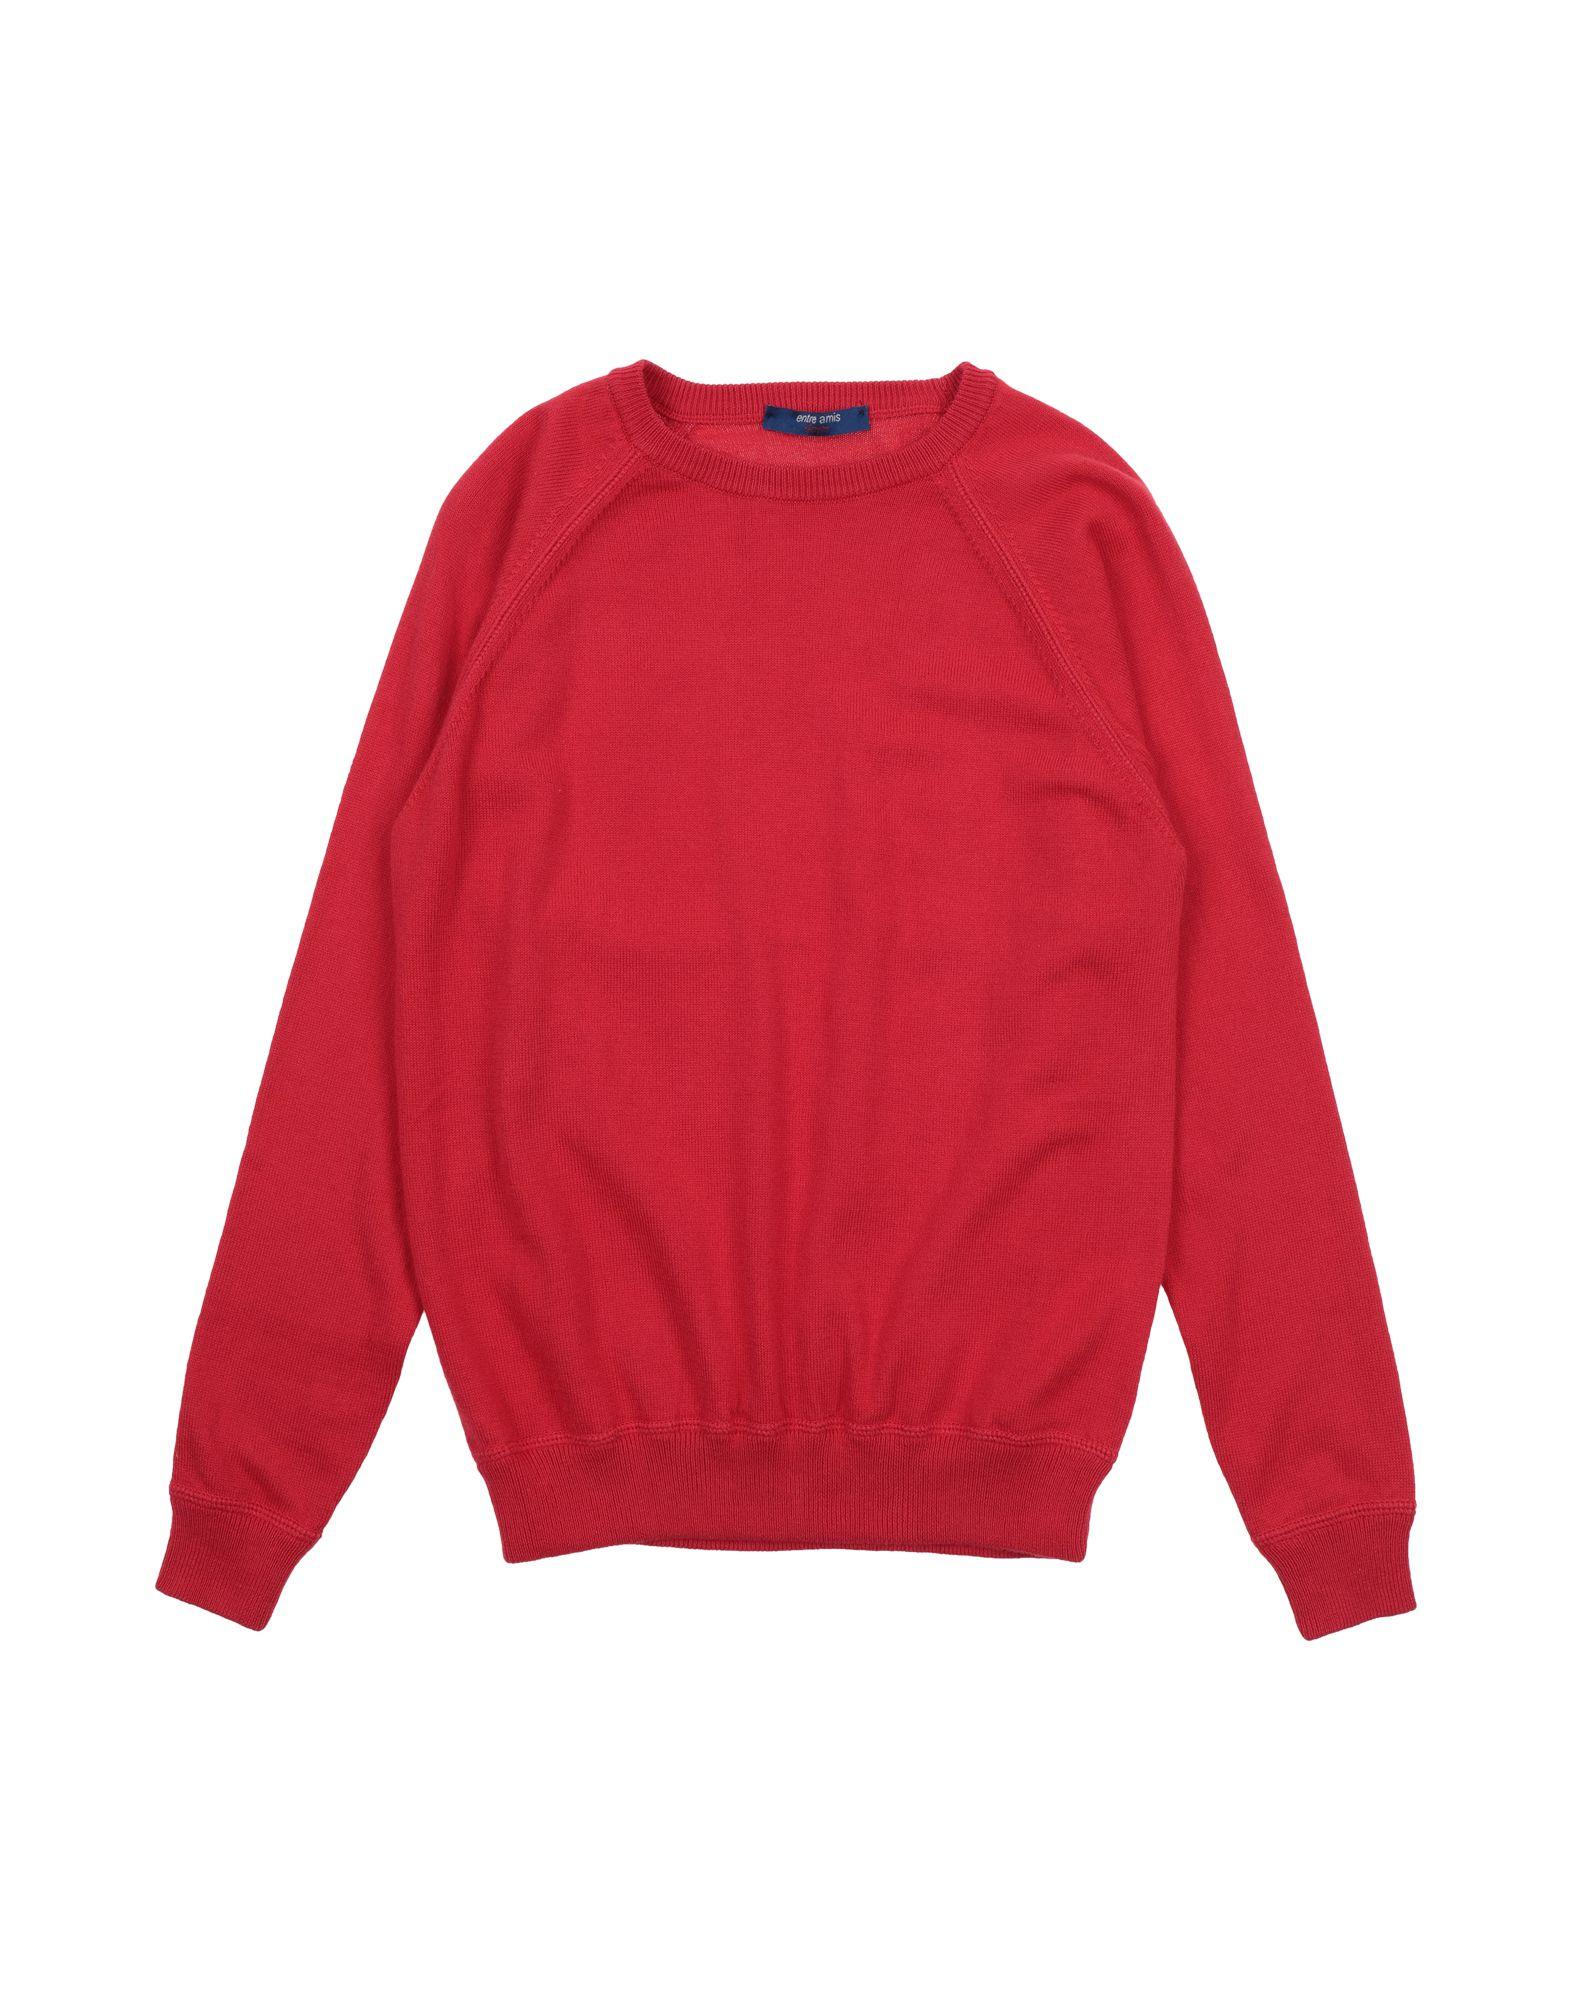 Entre Amis Garçon Kids' Sweaters In Red